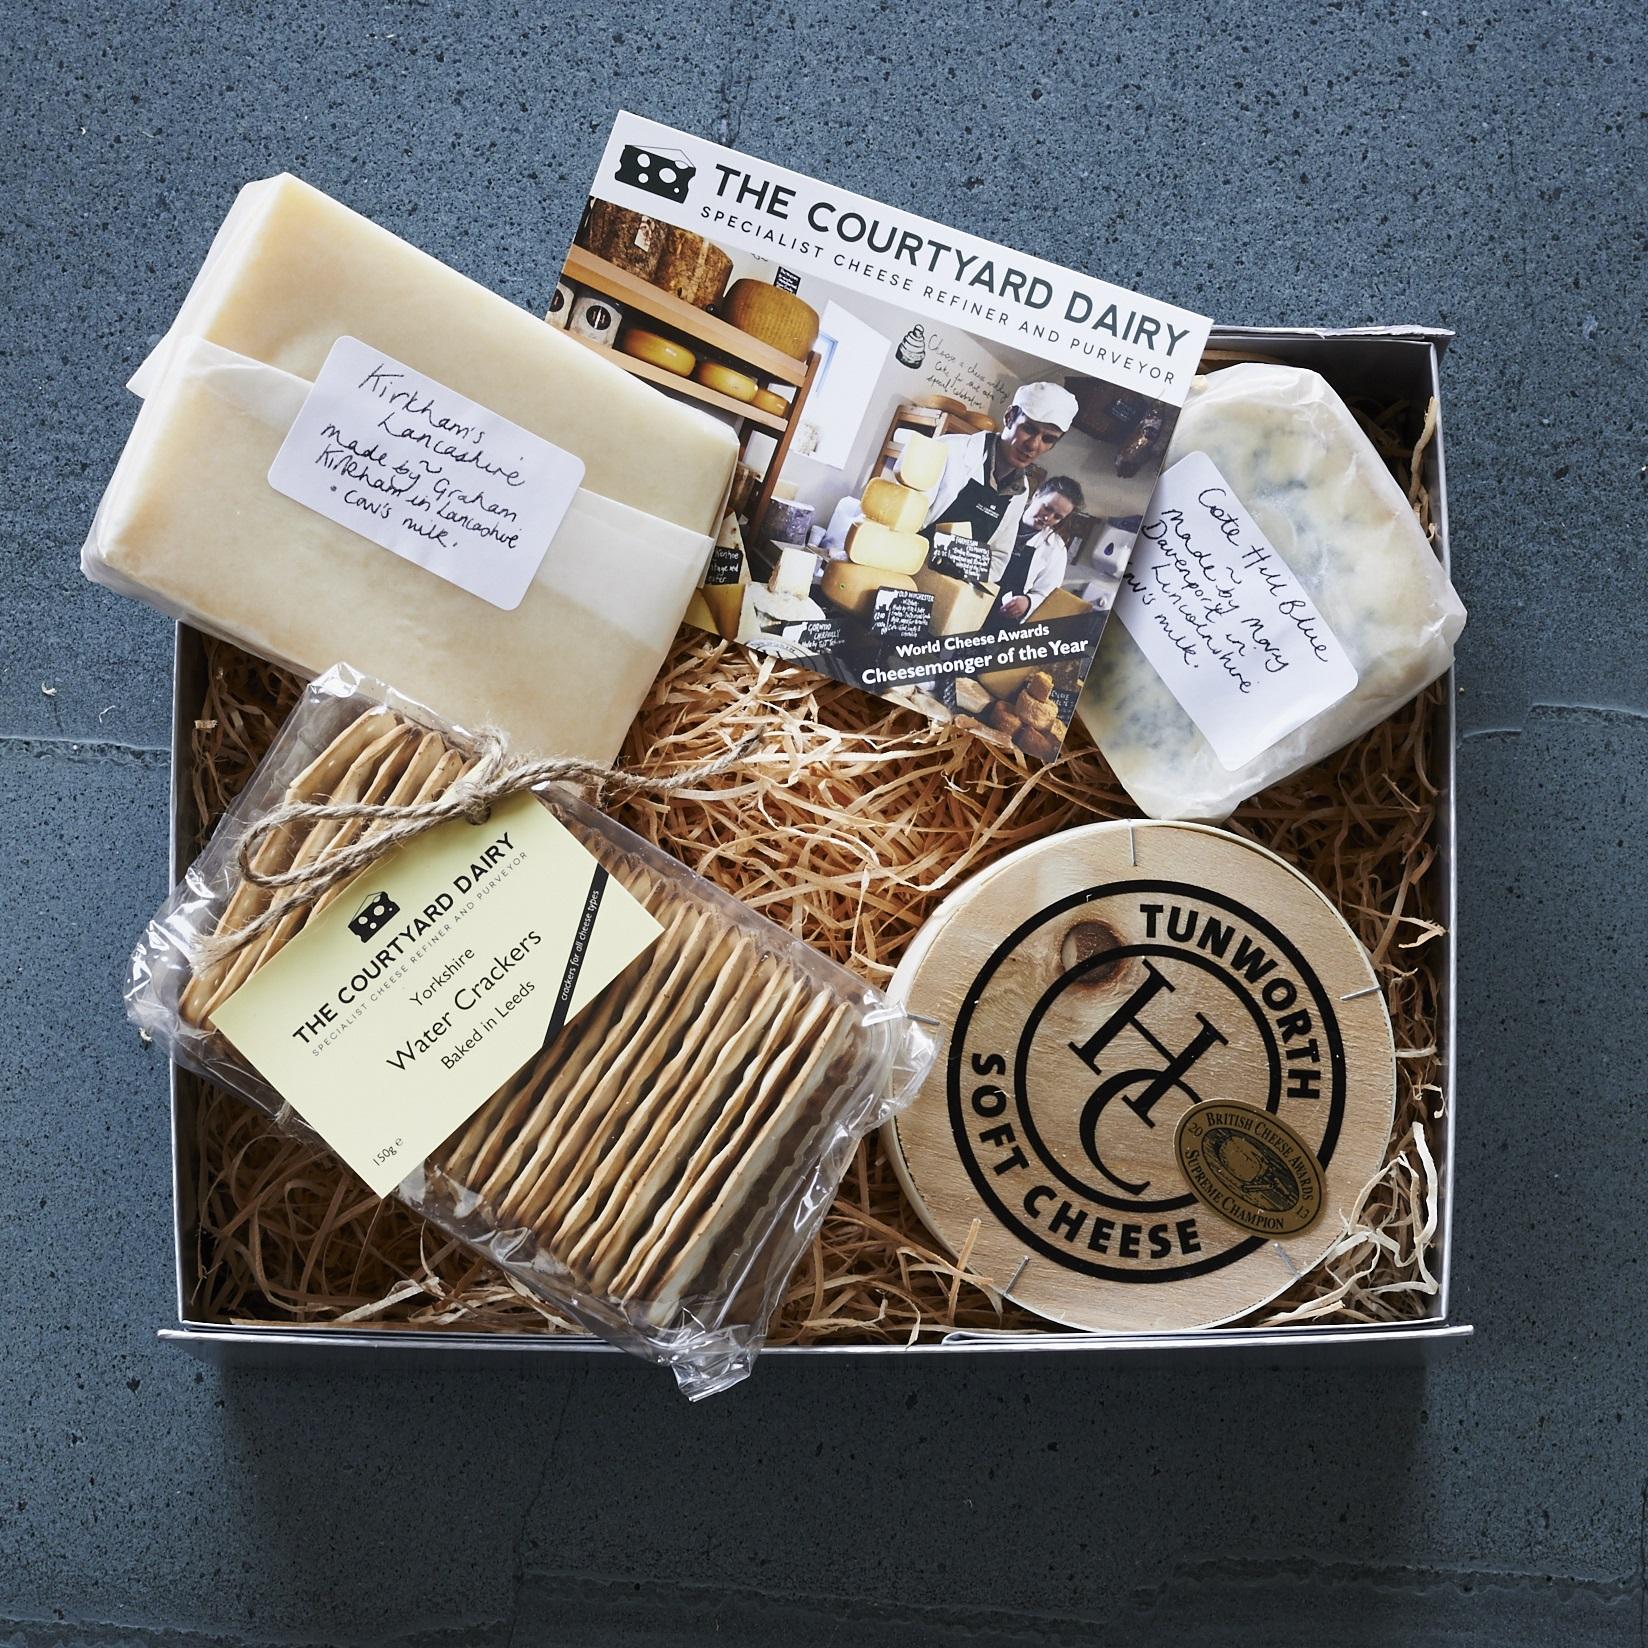 Courtyard Dairy cheese